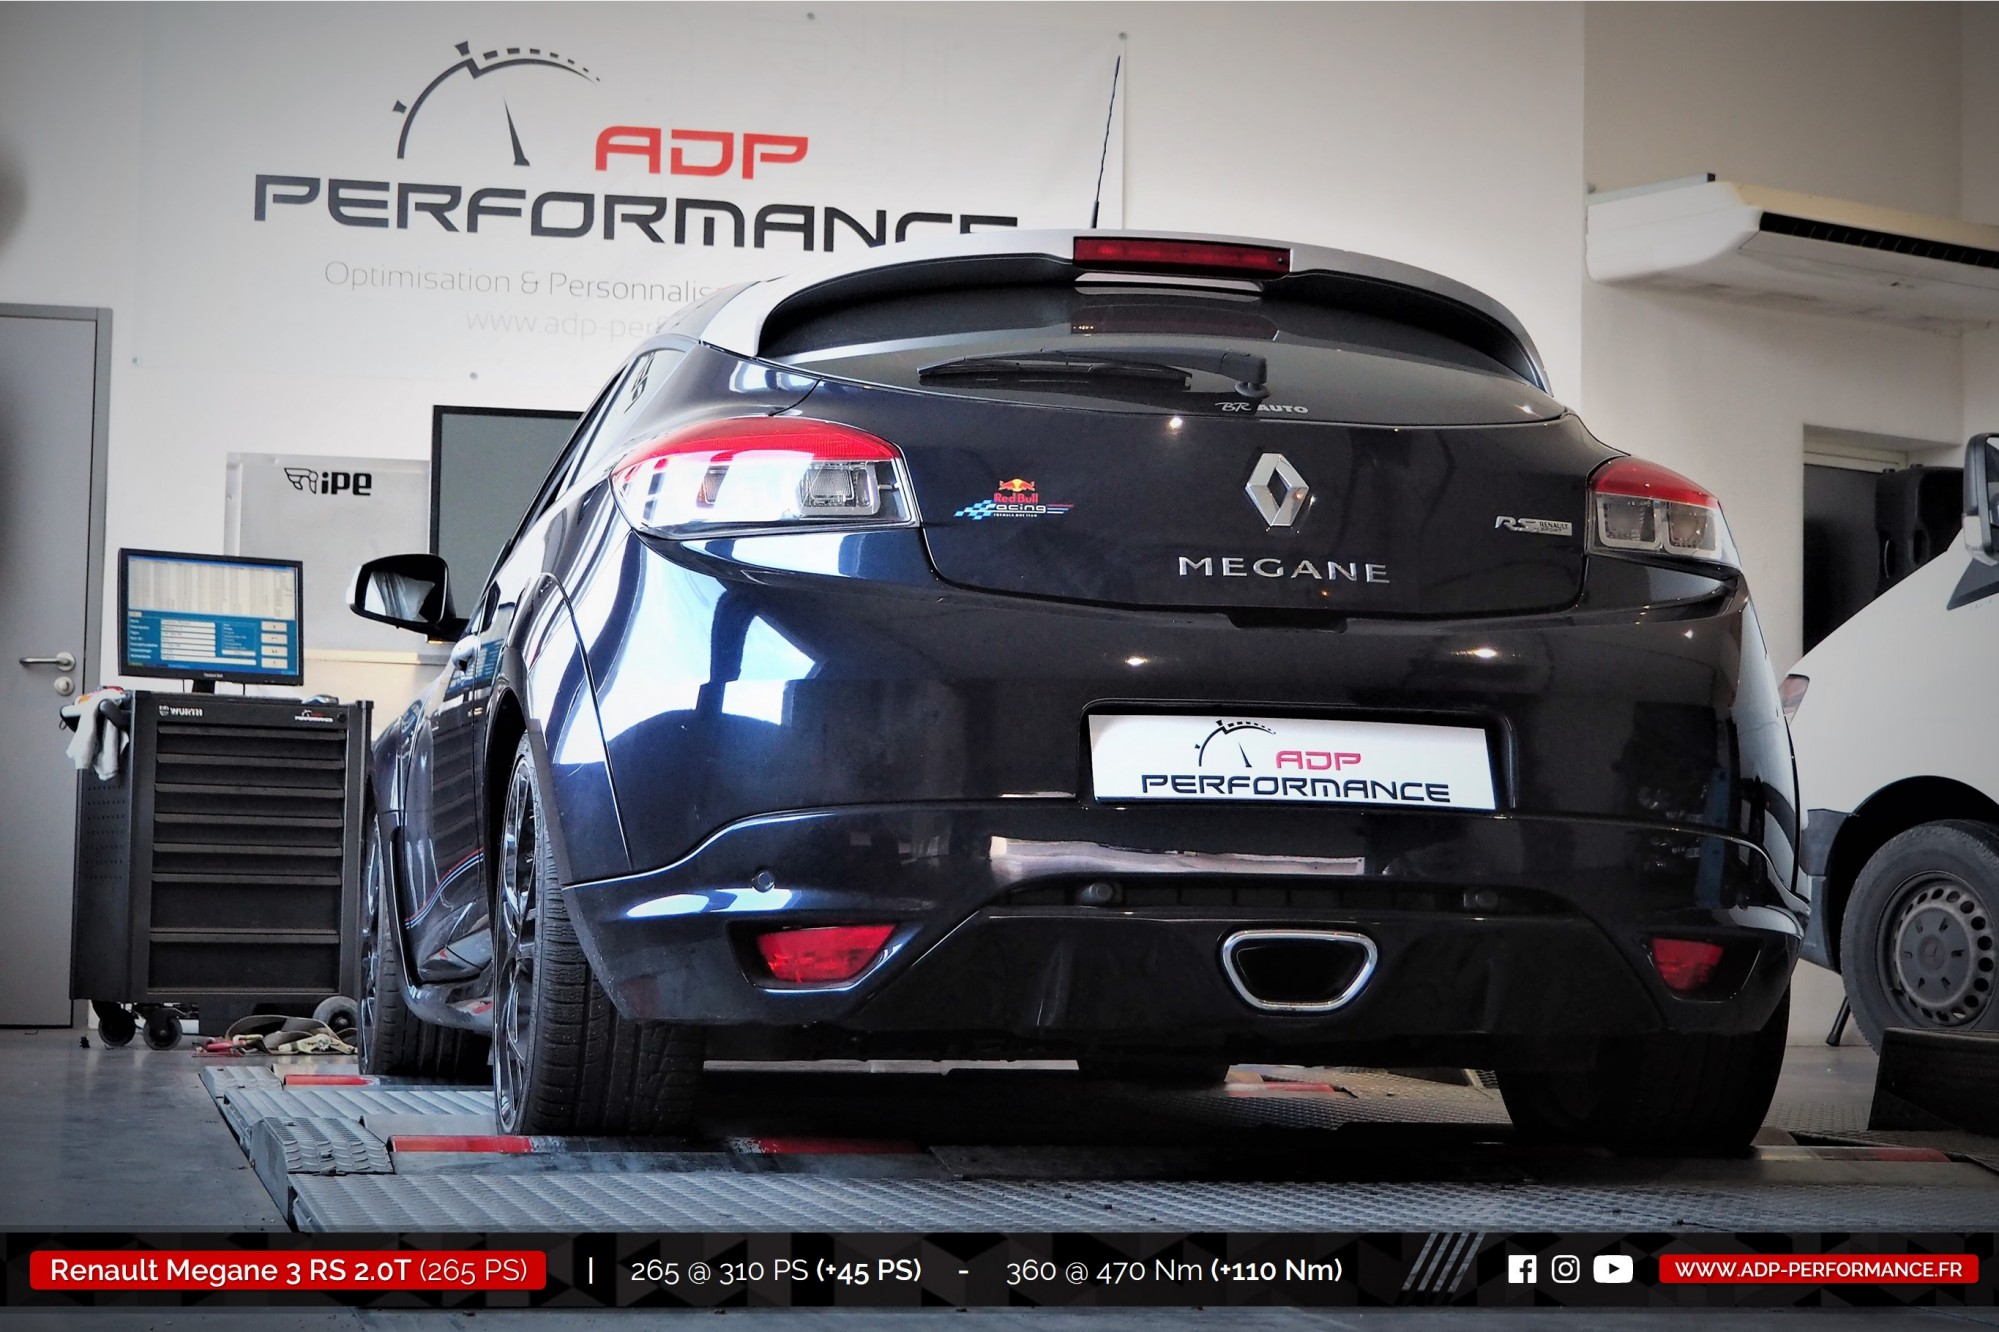 Reprogrammation moteur Arles, Cavaillon, Marignane - Renault Megane 3 (Ph3) RS 2.0T 265cv - ADP Performance